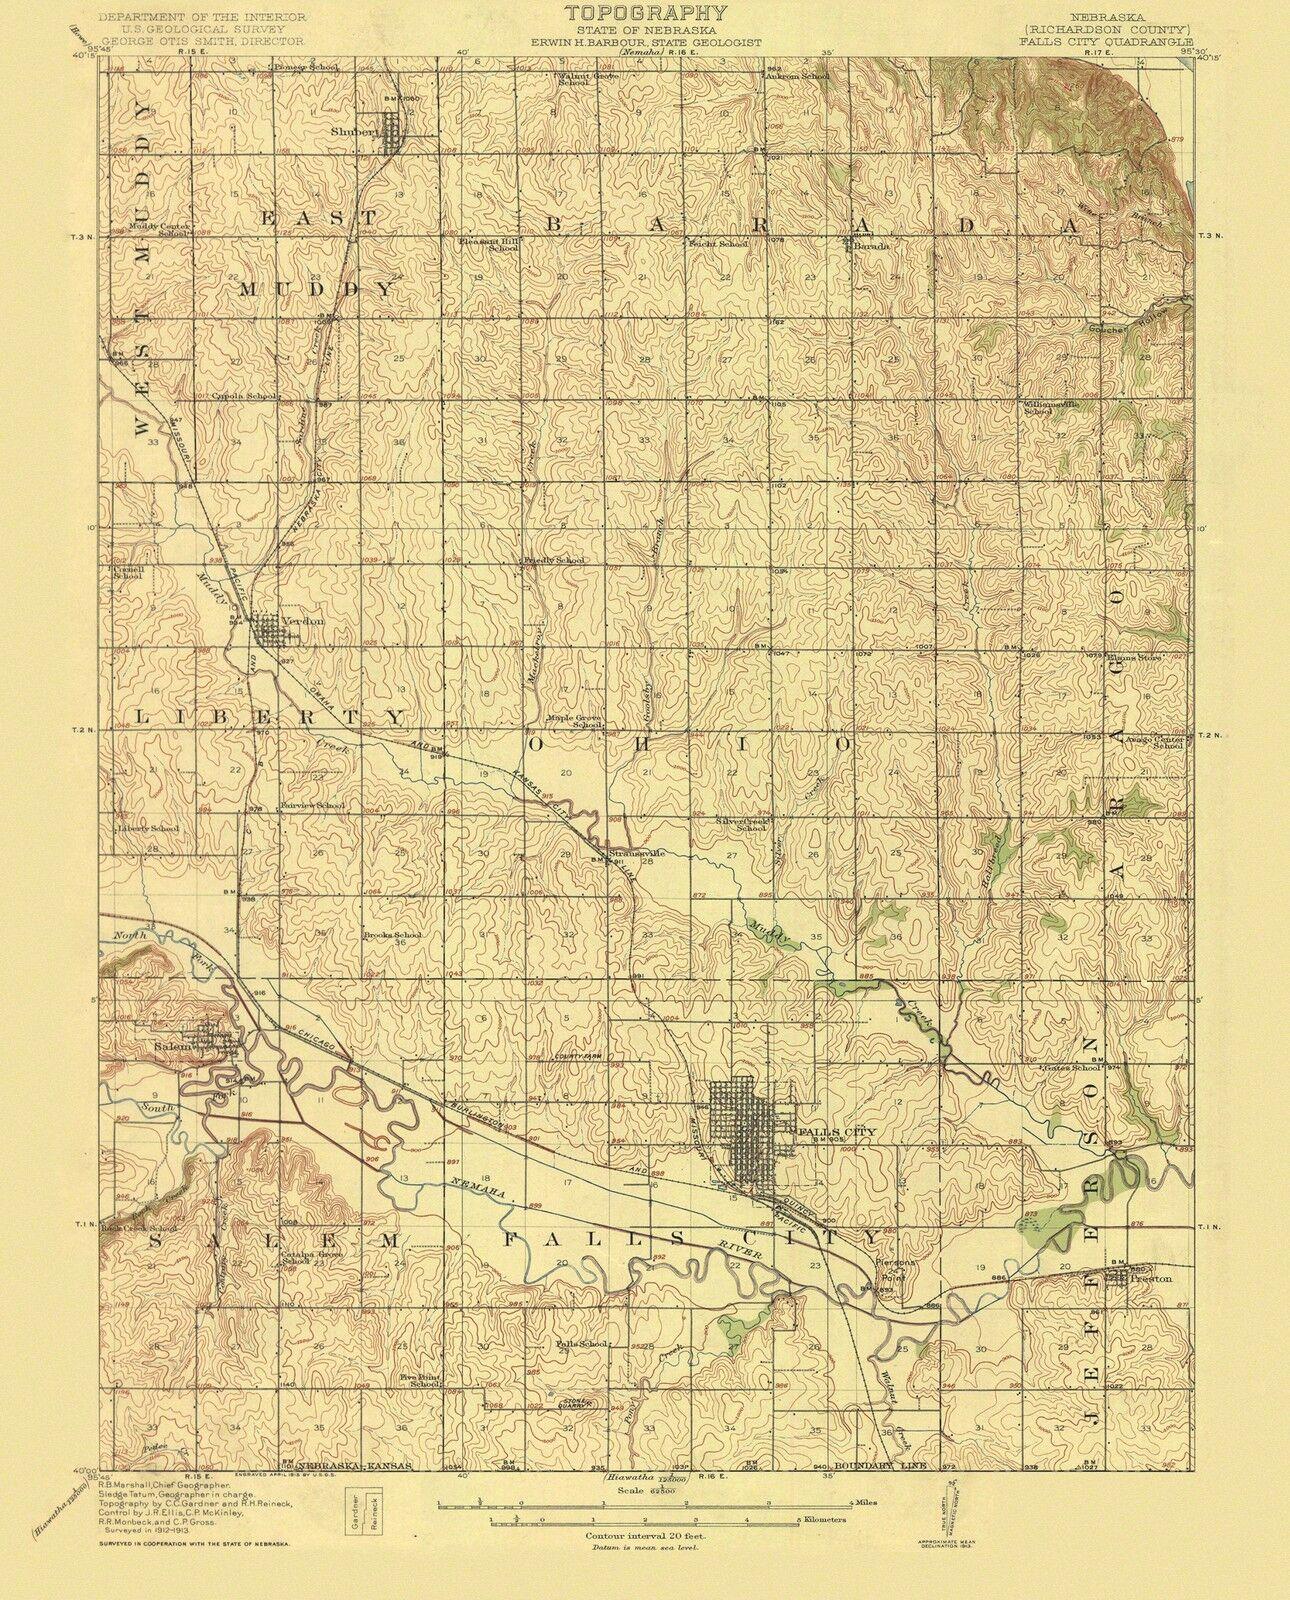 Falls City Nebraska Quad - USGS 1915 - 23 x 28.5